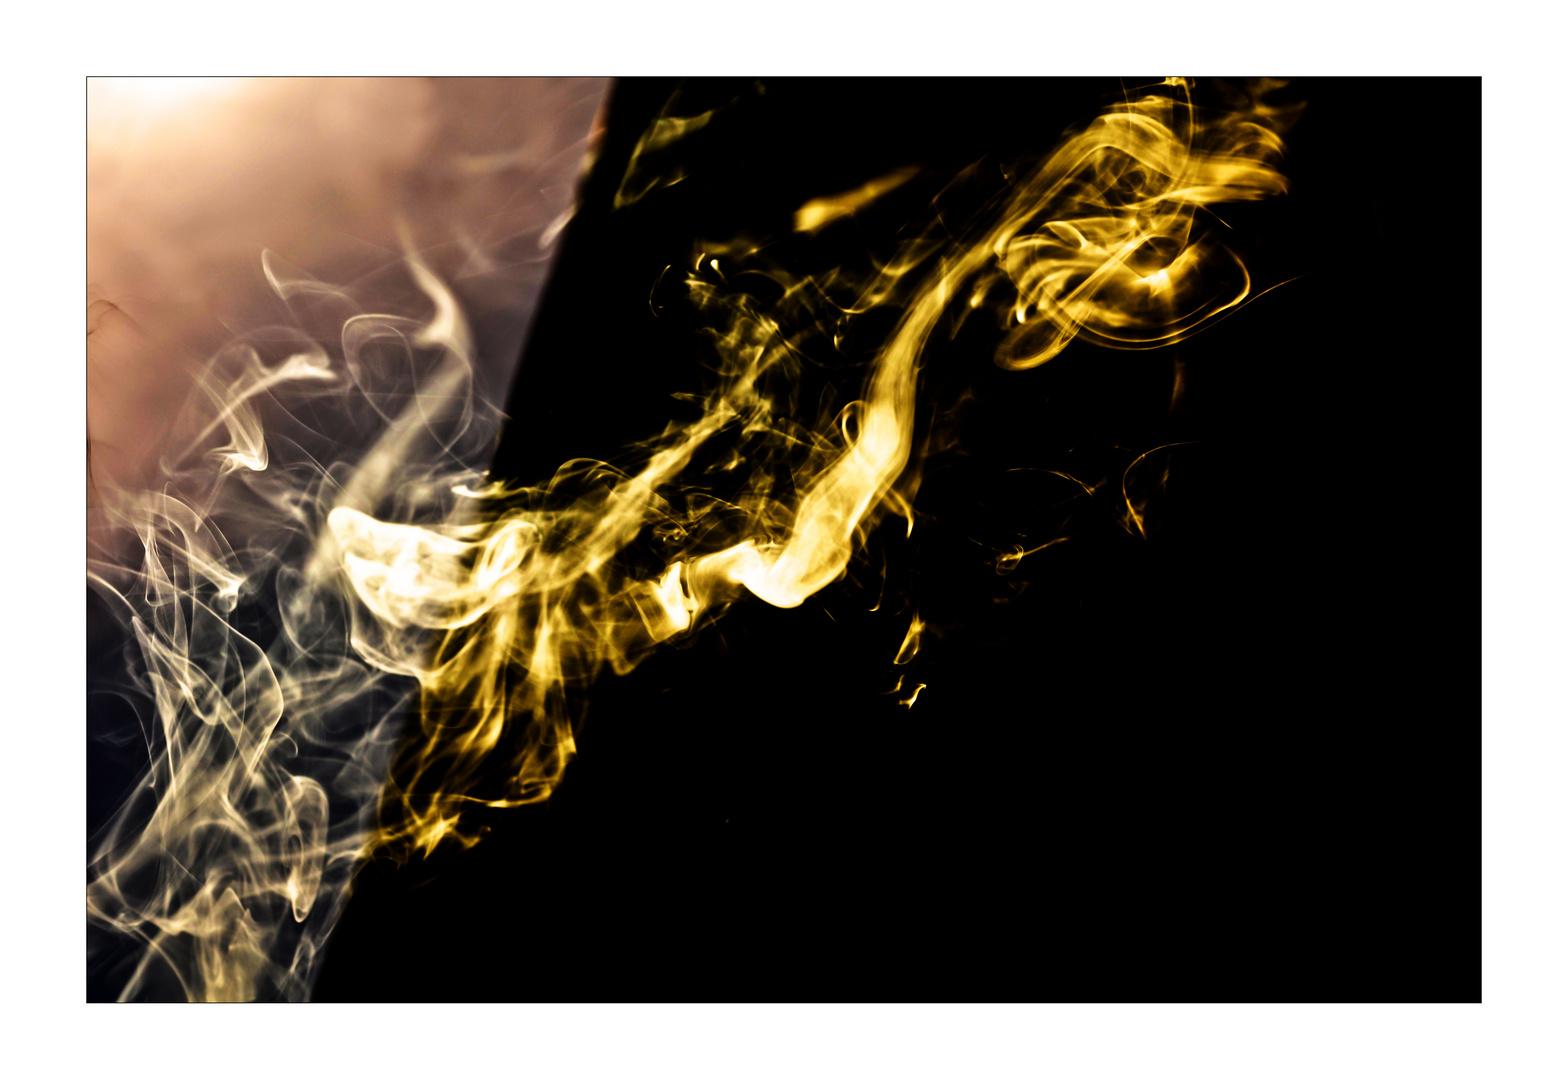 Partir en fumée